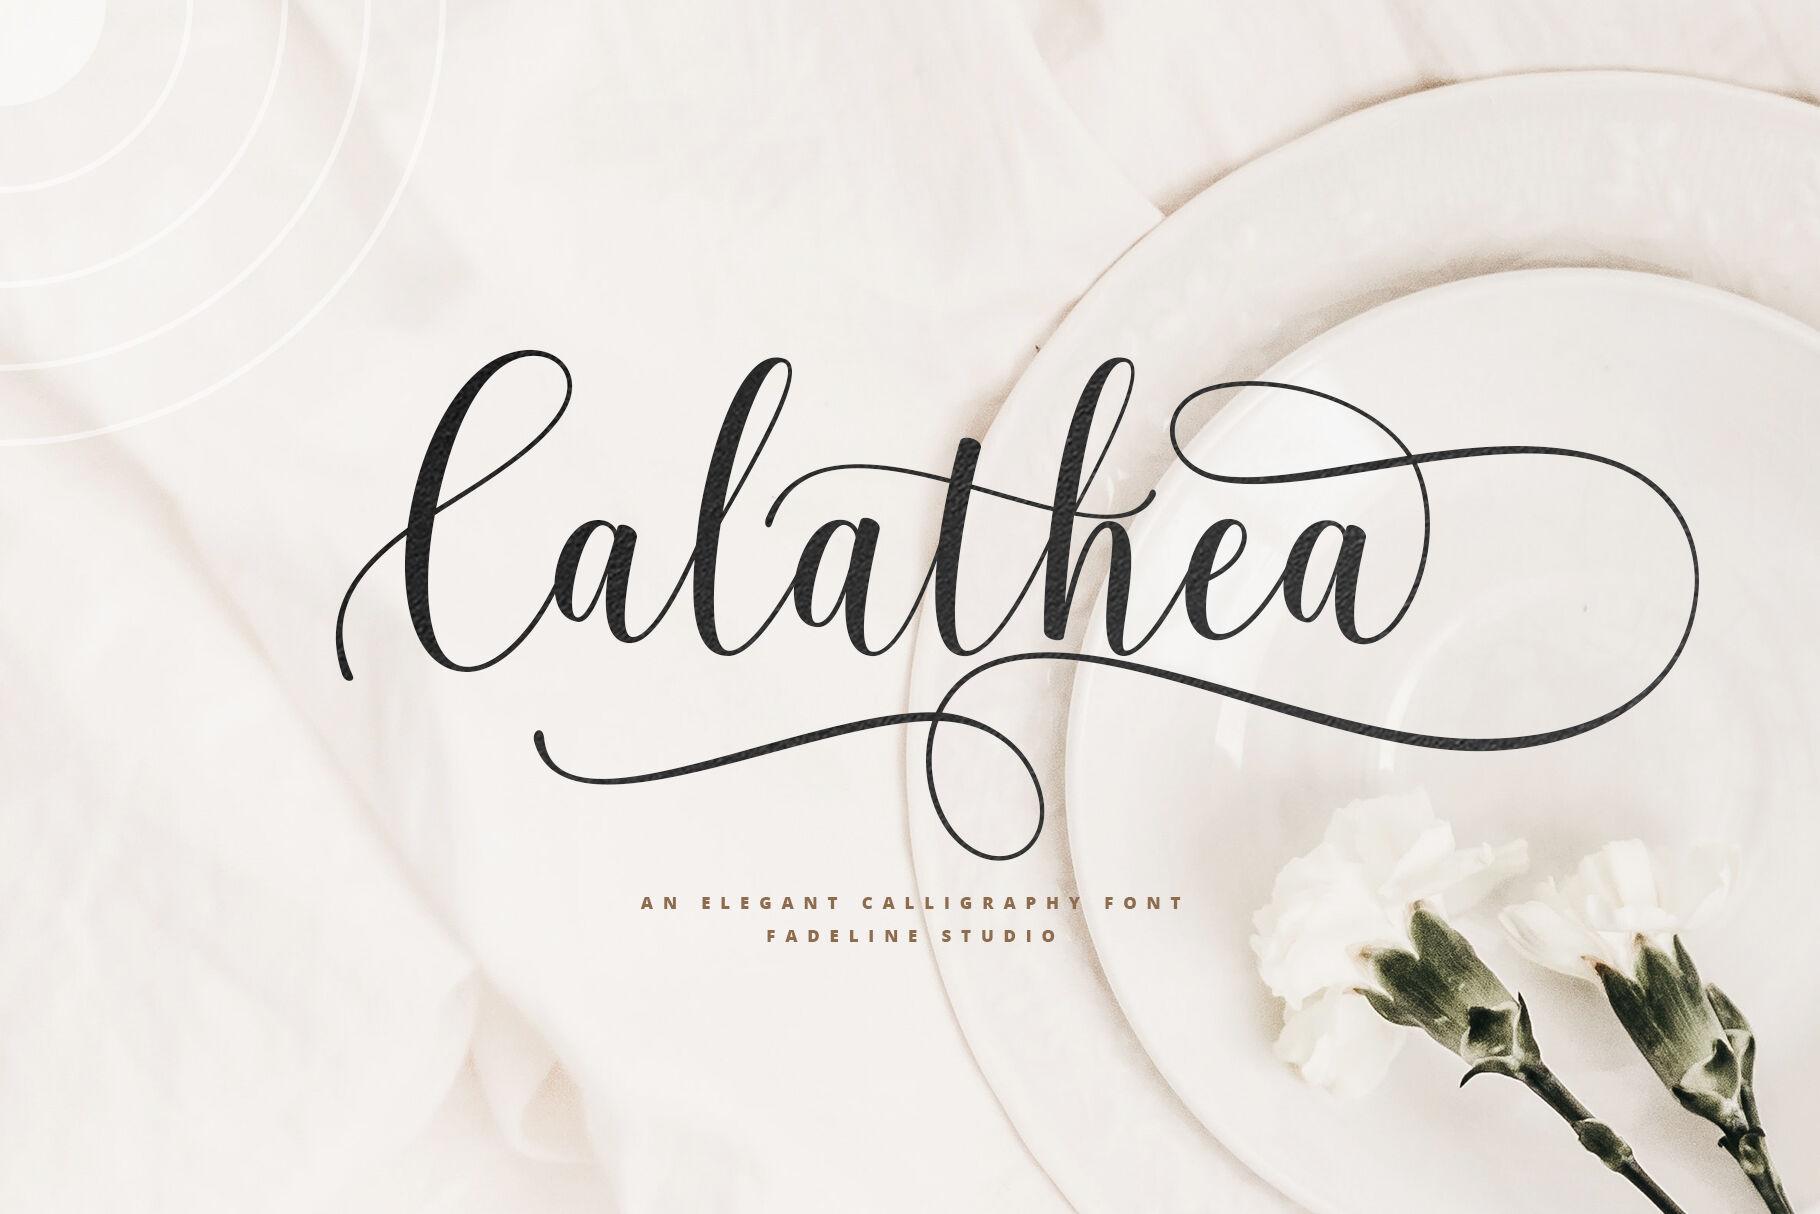 Calathea Elegant Calligraphy Font By Fadeline Thehungryjpeg Com